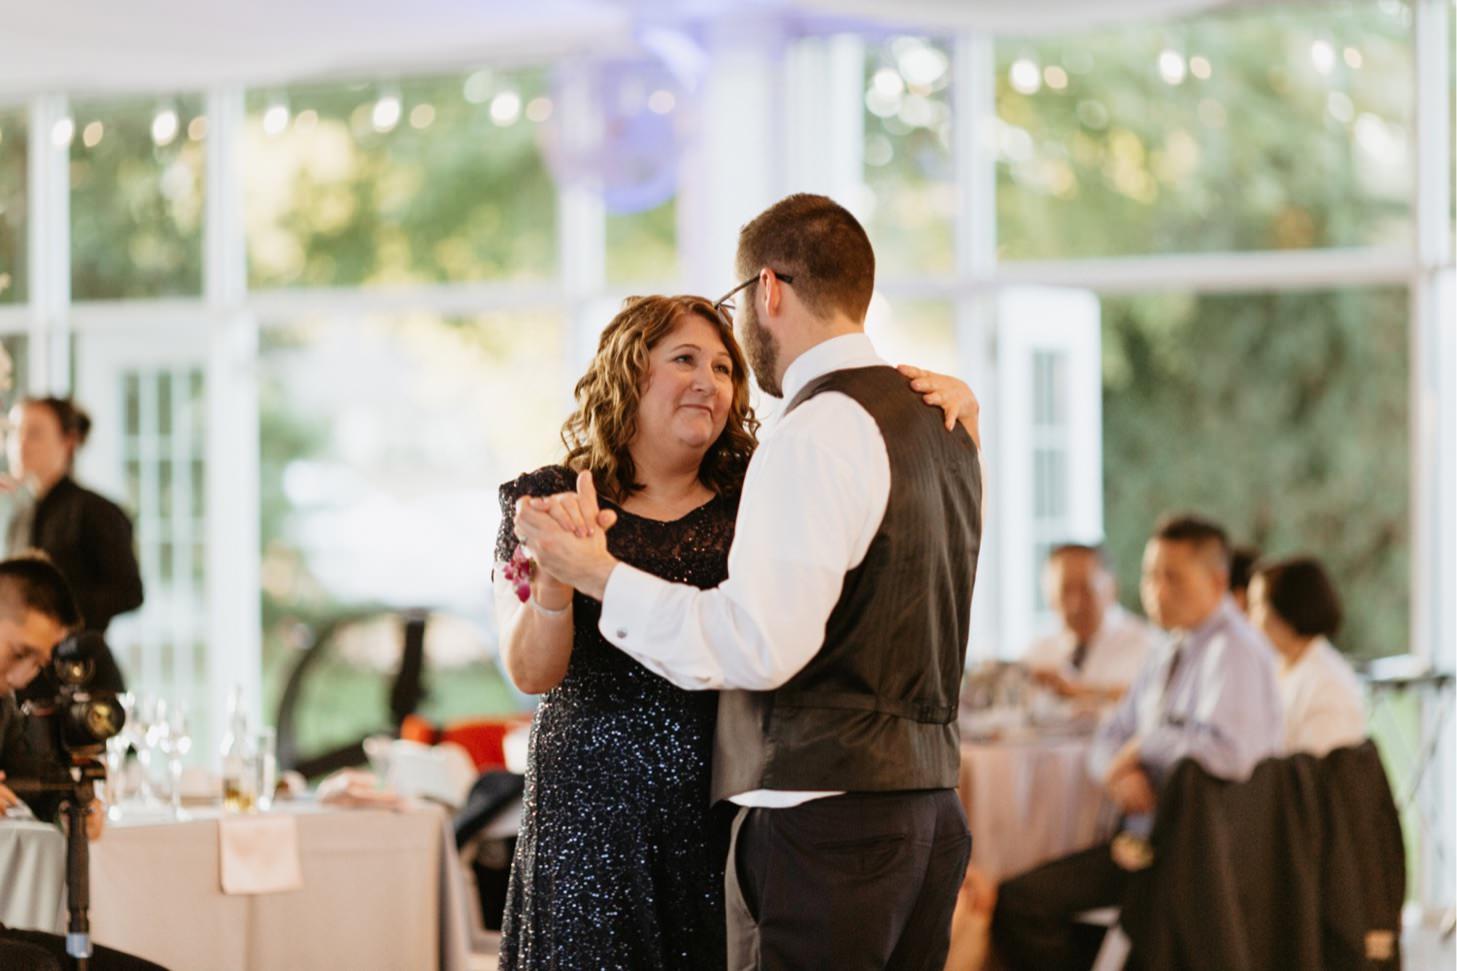 ritz-charles-wedding-reception-downtown-indianapolis-wedding-photographer053.JPG